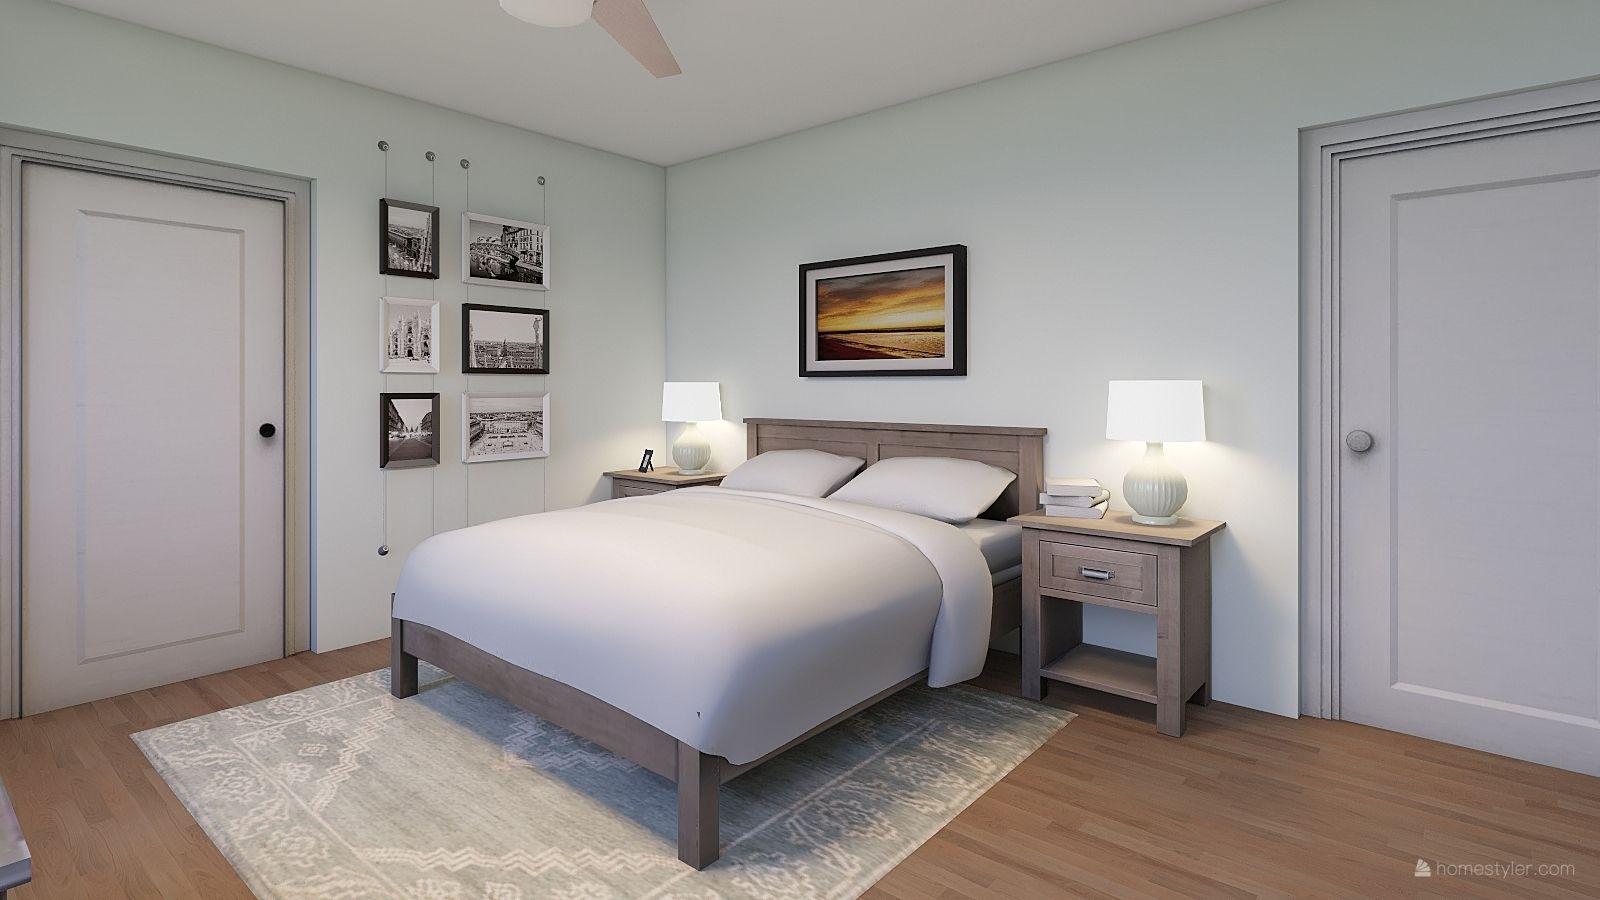 Bedroom Design By Kassidy Duffield Interiordesign Homedecor